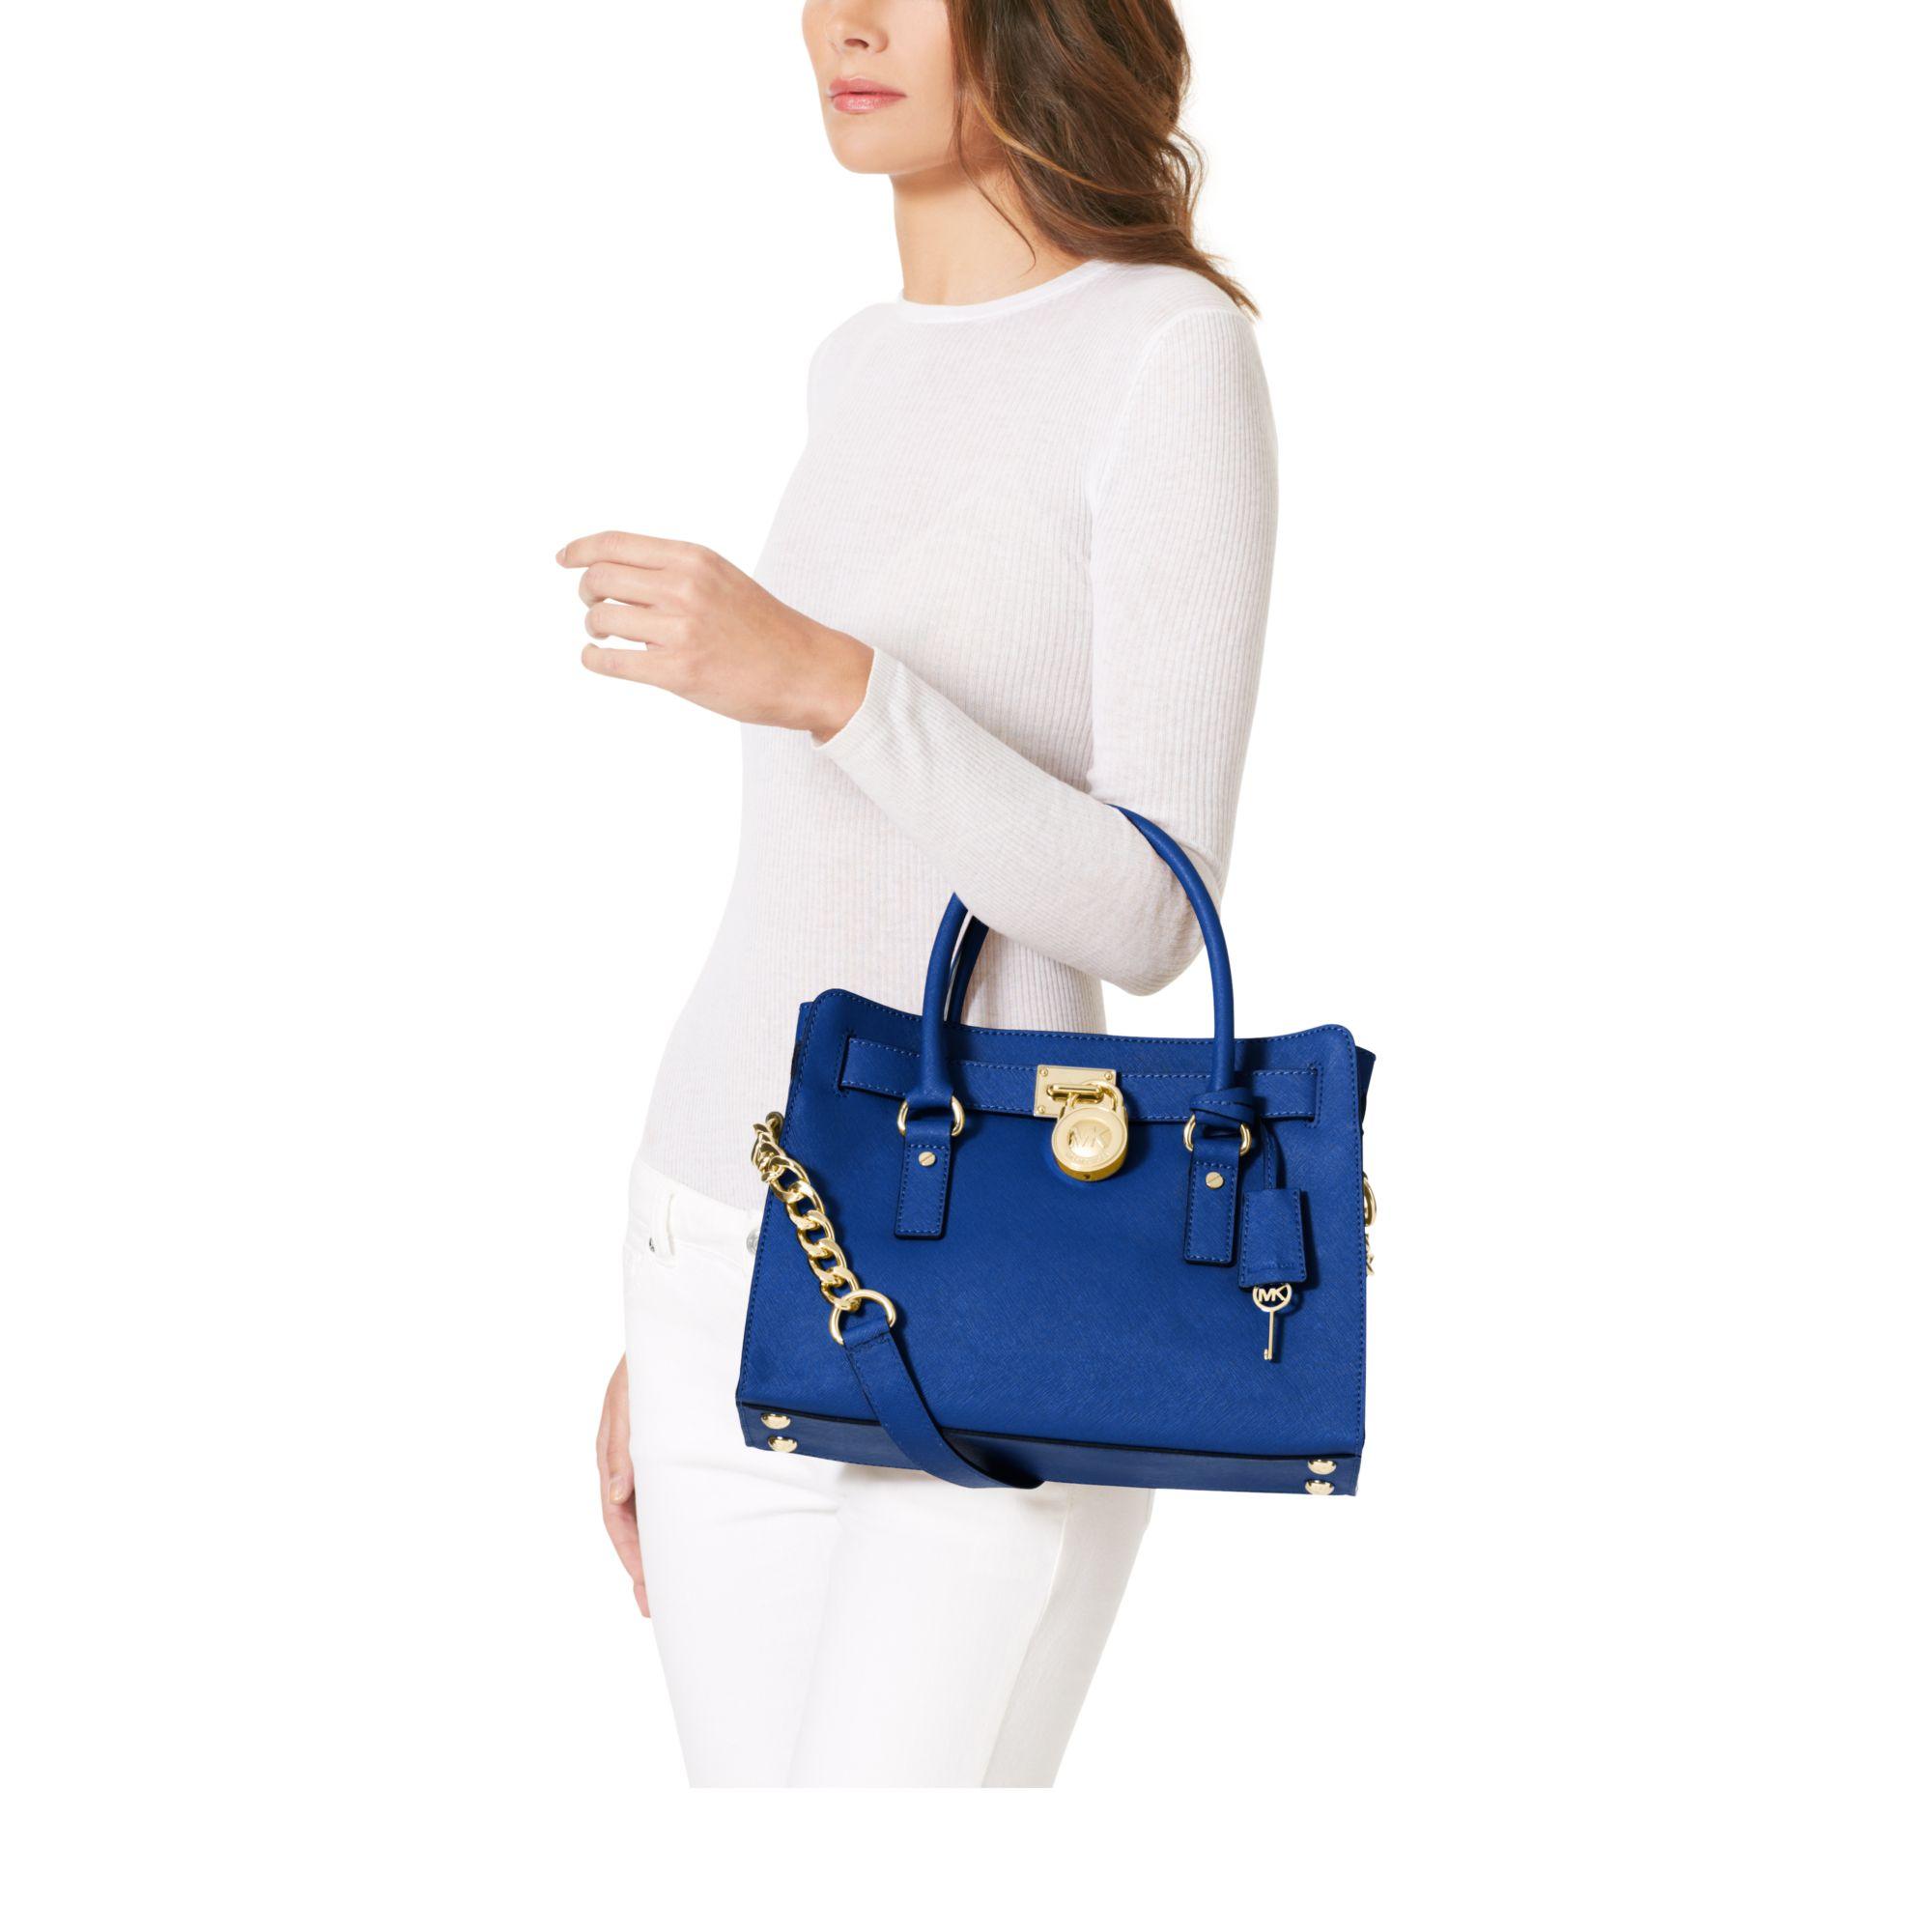 e33a0634e09c Michael Kors Hamilton Saffiano Leather Medium Satchel in Blue - Lyst